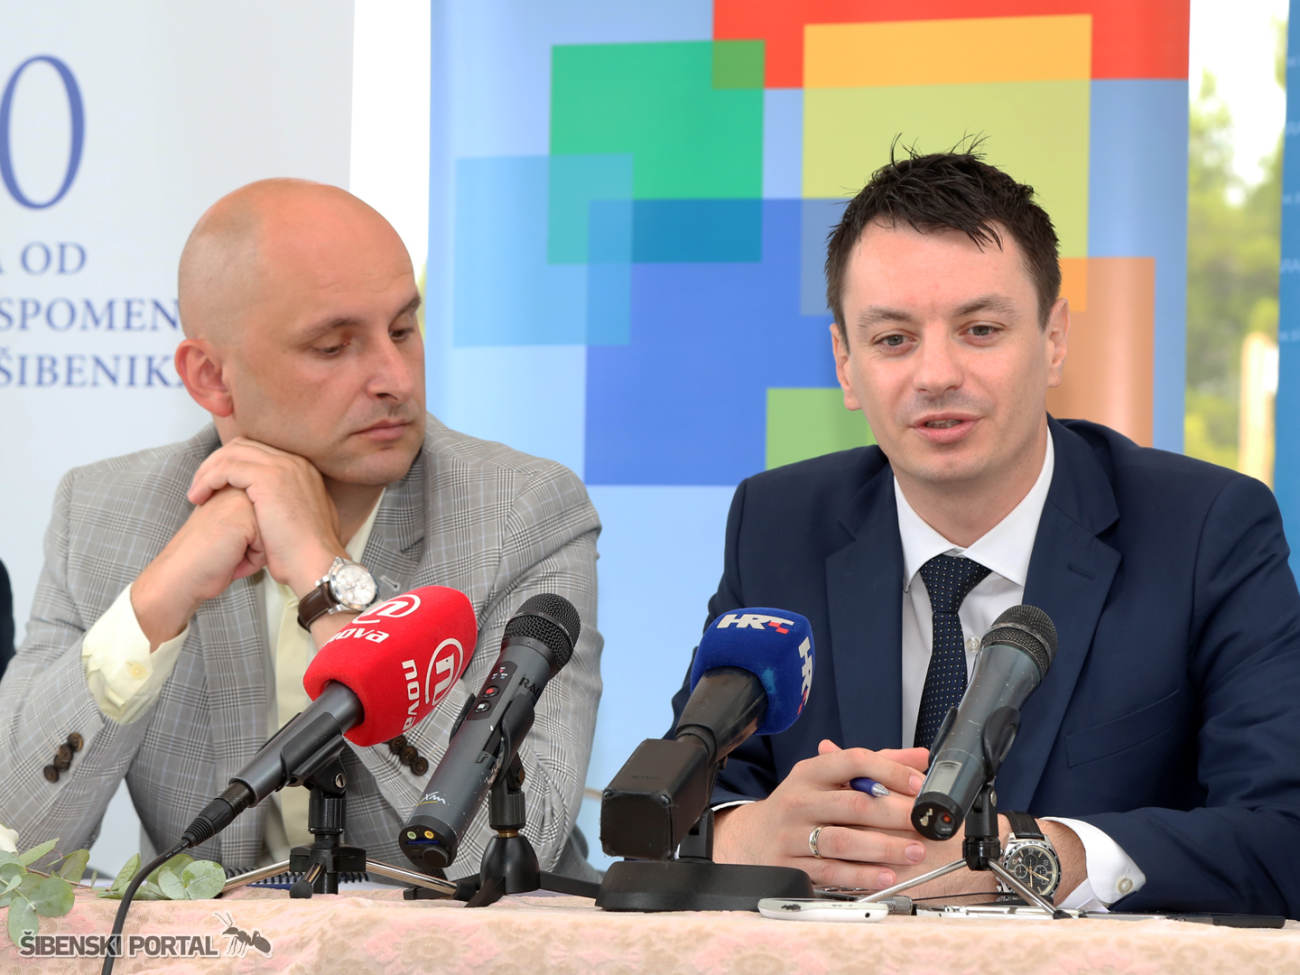 tvrdava barone ministar tolusic tomislav petric 010816 5